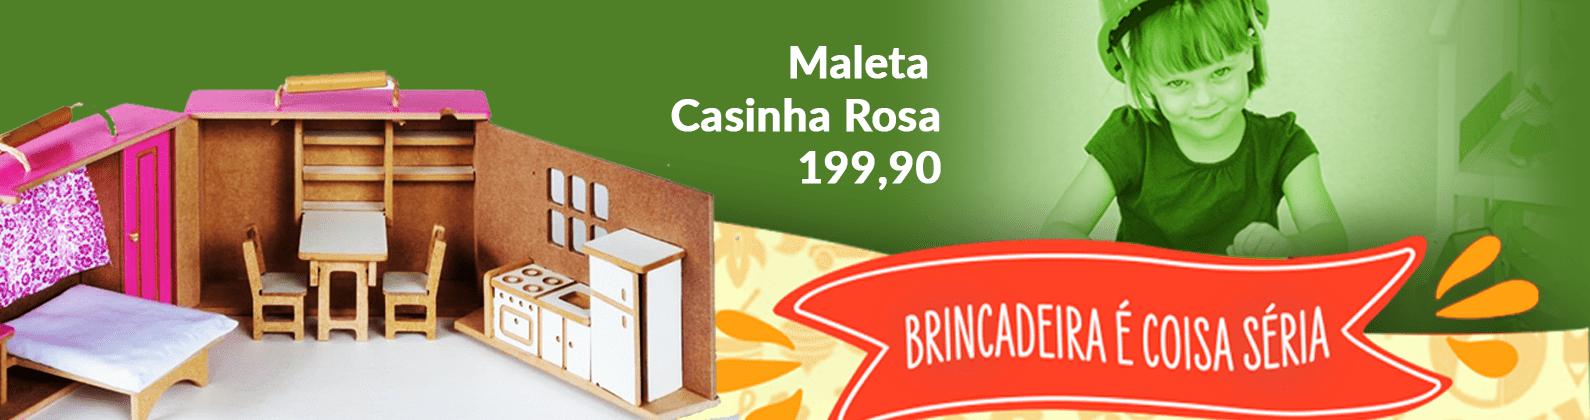 Maleta Casinha Rosa